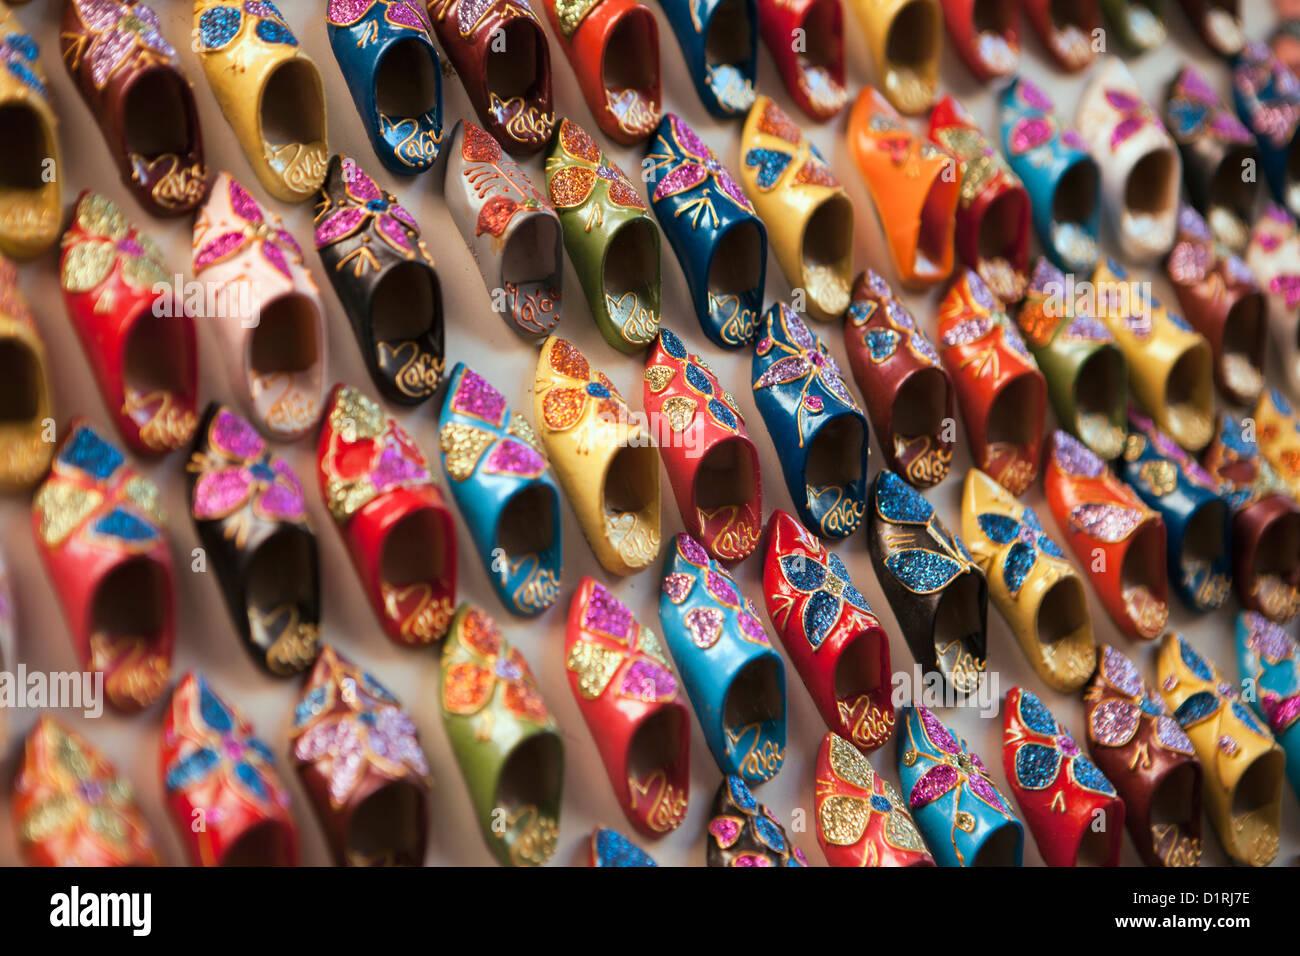 Marokko, Marrakesch, Markt. Kleinen Maultieren oder Hausschuhe zum Verkauf. Stockbild